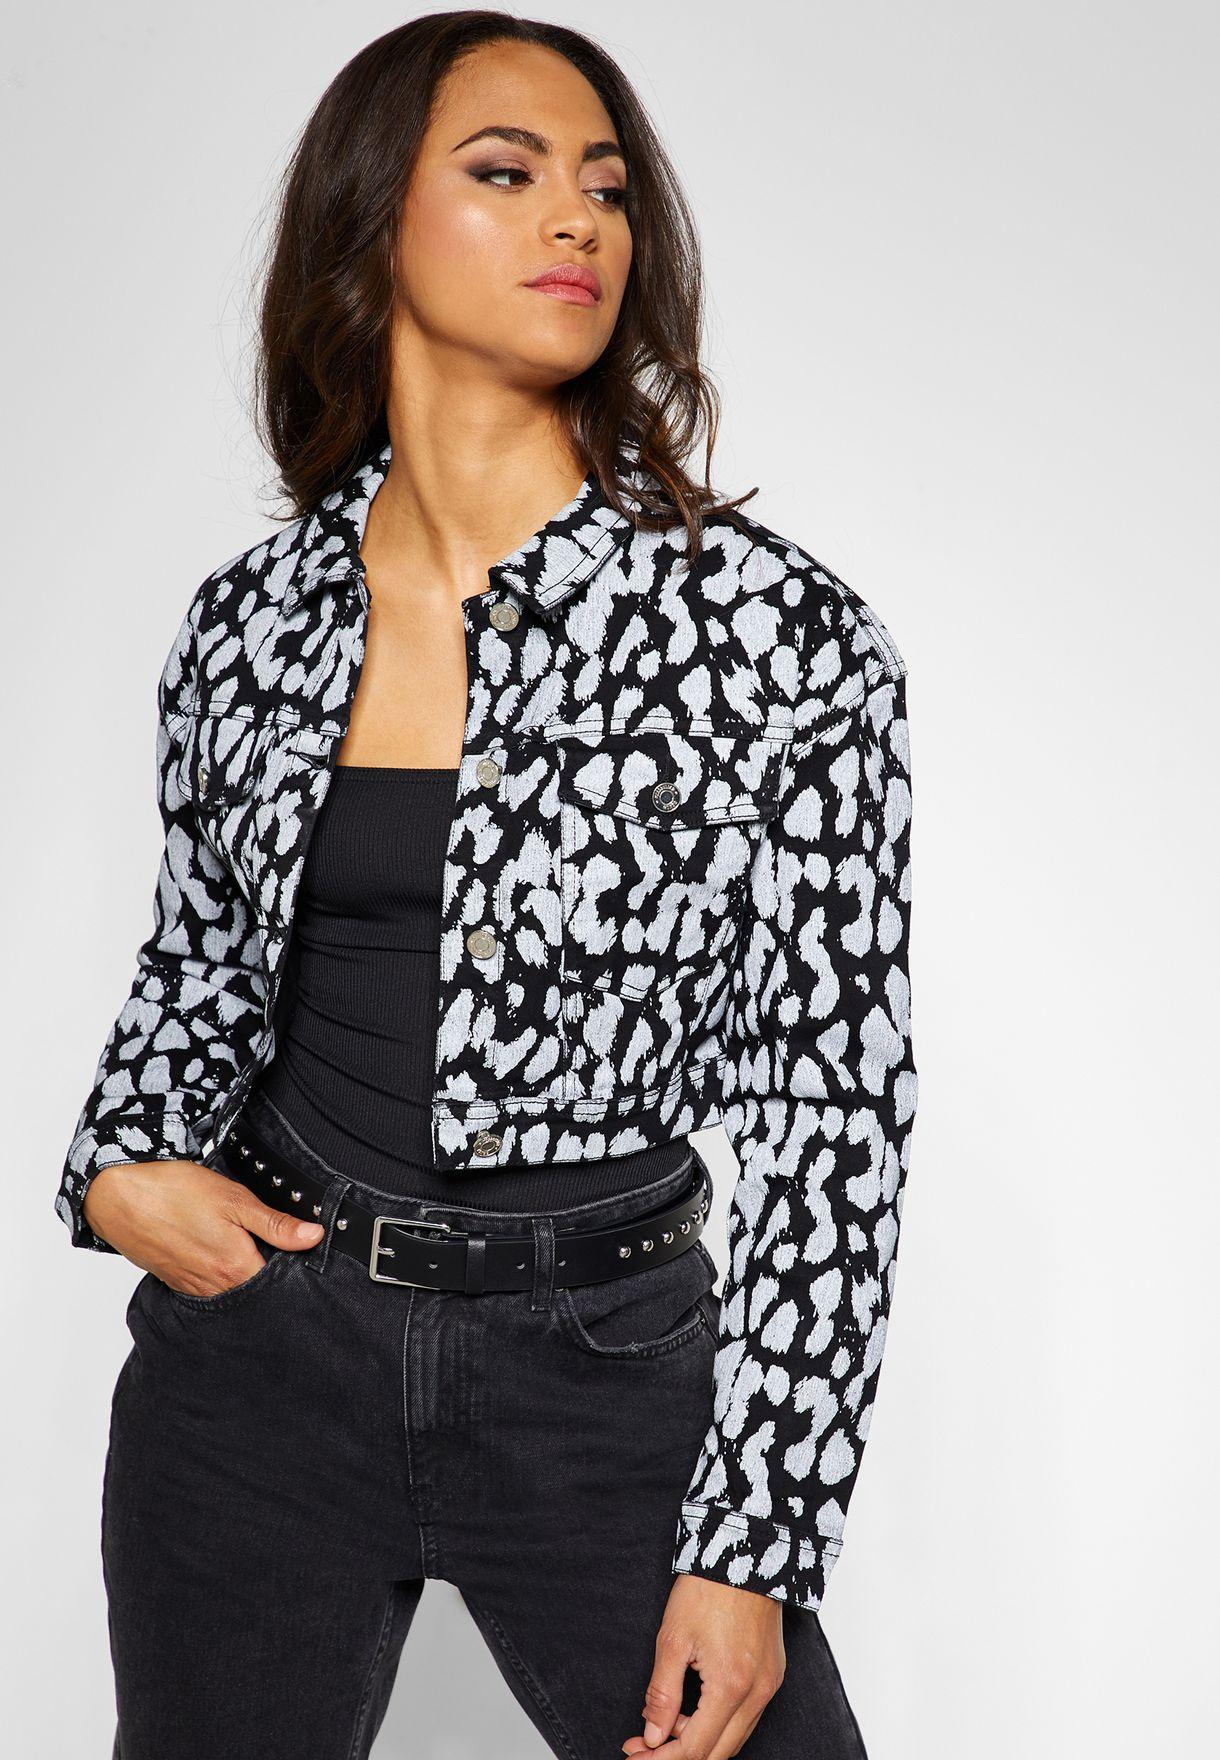 b2e2cd842298 Shop Missguided prints Leopard Print Cropped Denim Jacket G1805579 ...